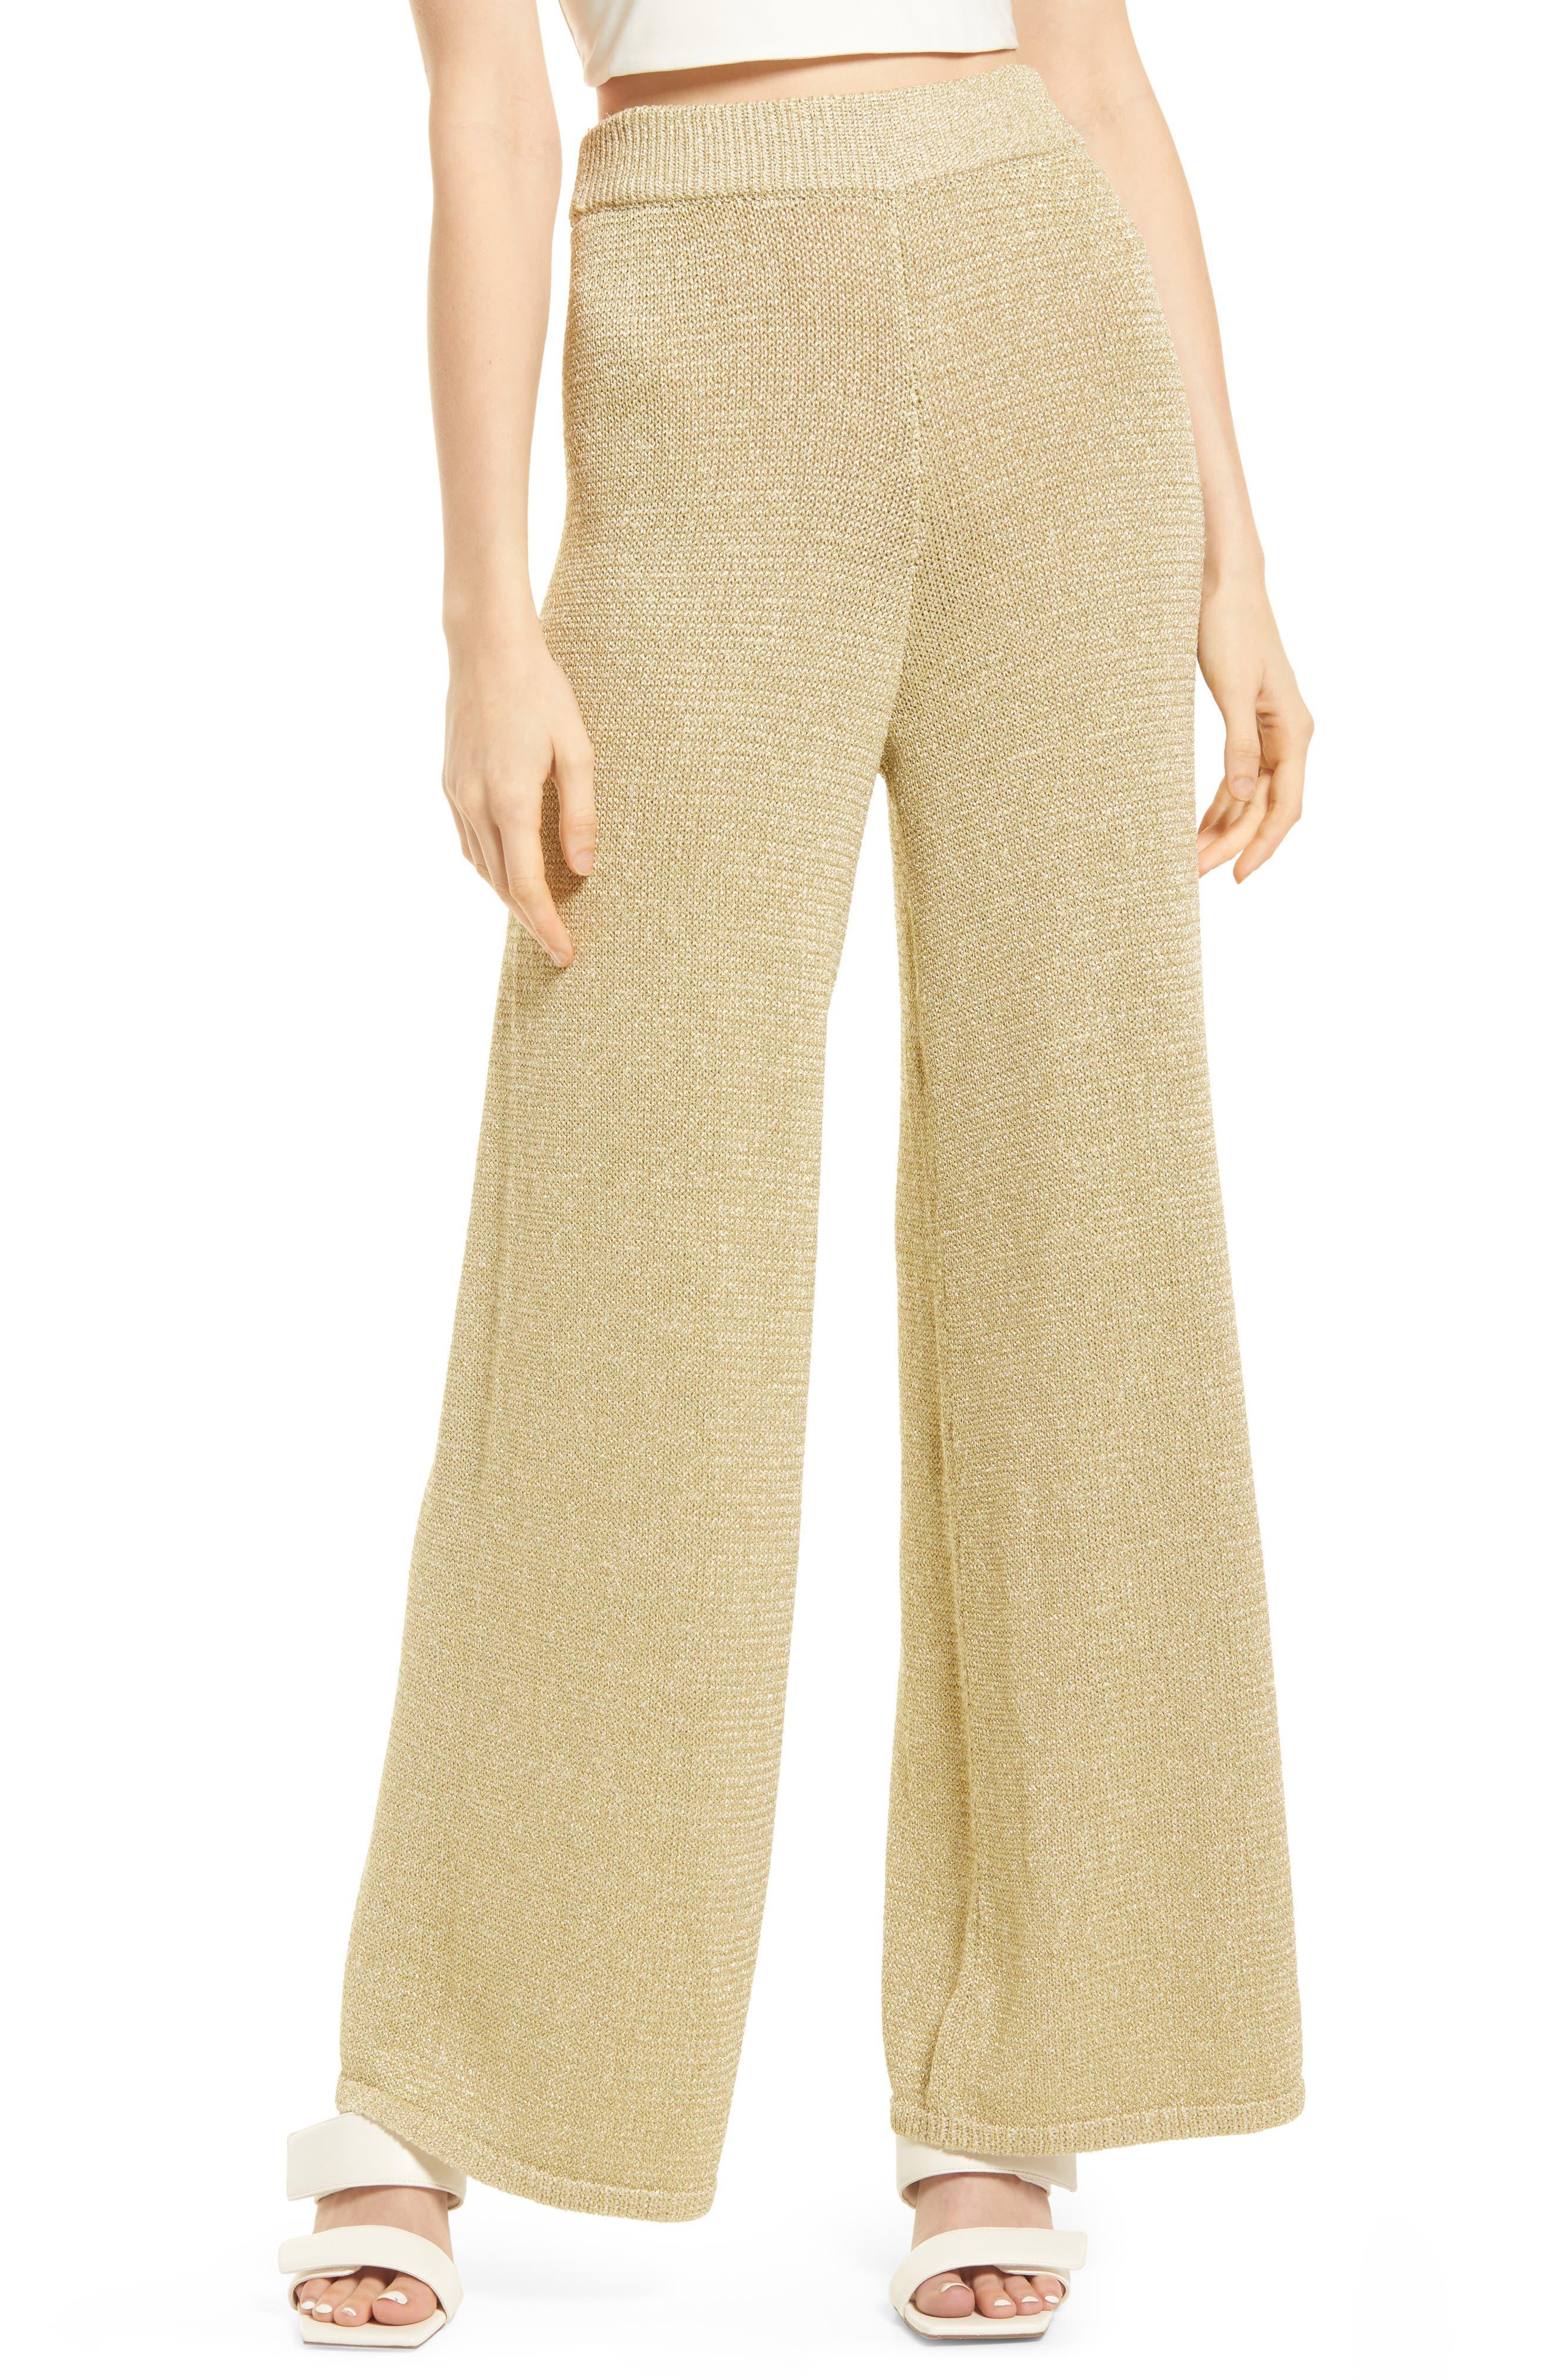 60s Pants, Jeans, Hippie, Flares, Jumpsuits Open Edit Metallic Wide Leg Pants Size Large in Metallic Gold at Nordstrom $69.00 AT vintagedancer.com